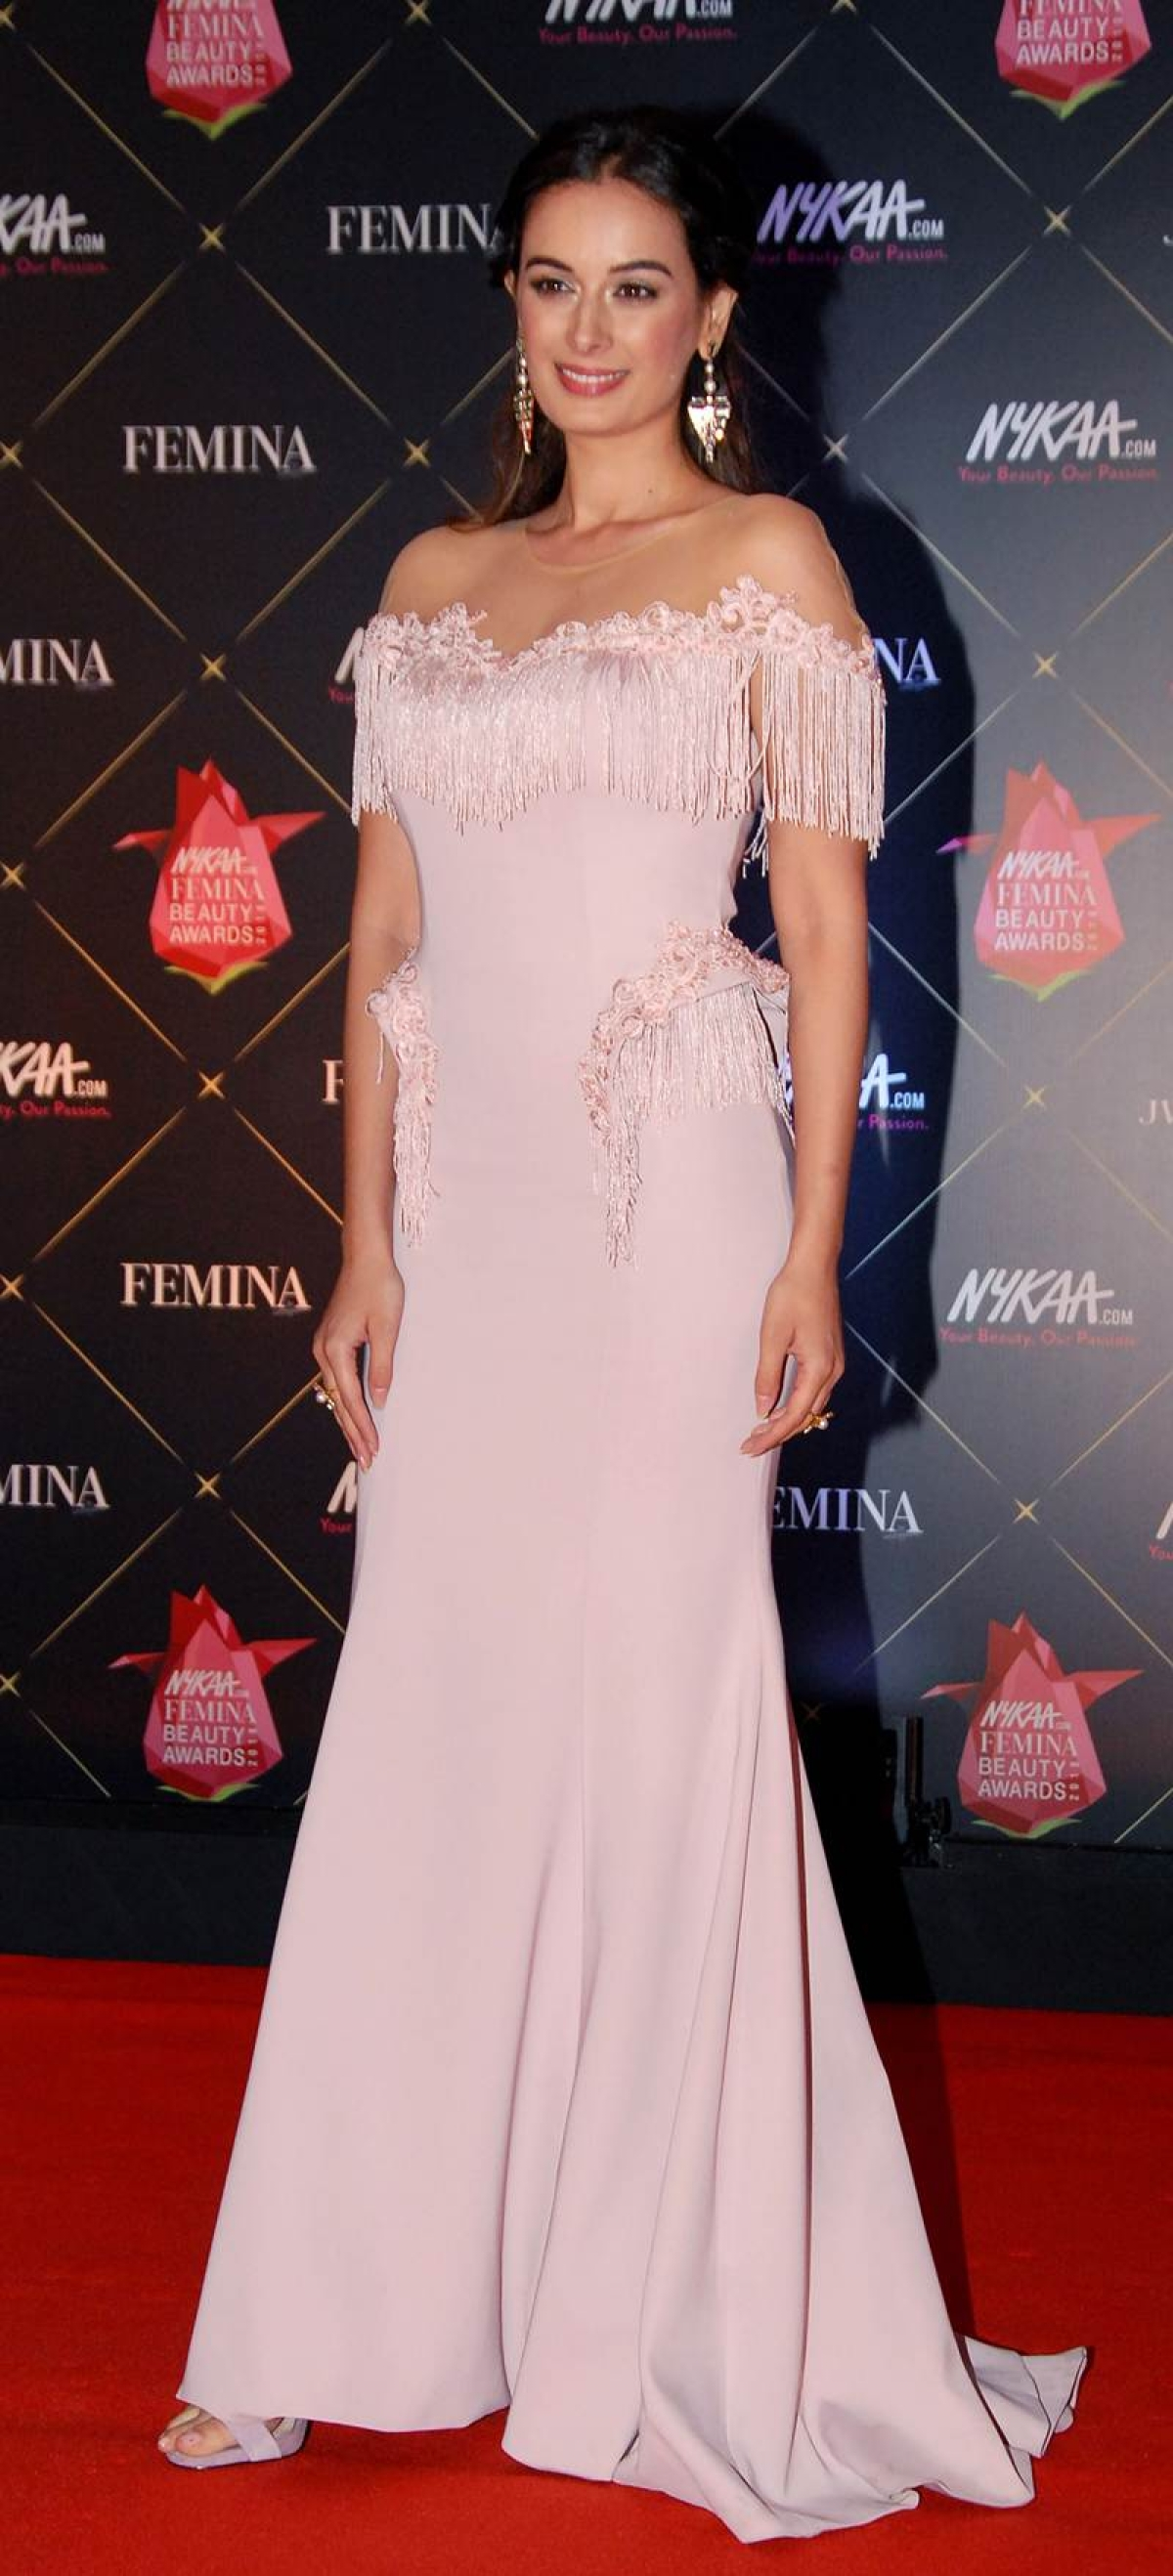 Evelyn Sharma poses during the 'Femina Beauty Awards 2018' in Mumbai. / AFP PHOTO / Sujit Jaiswal